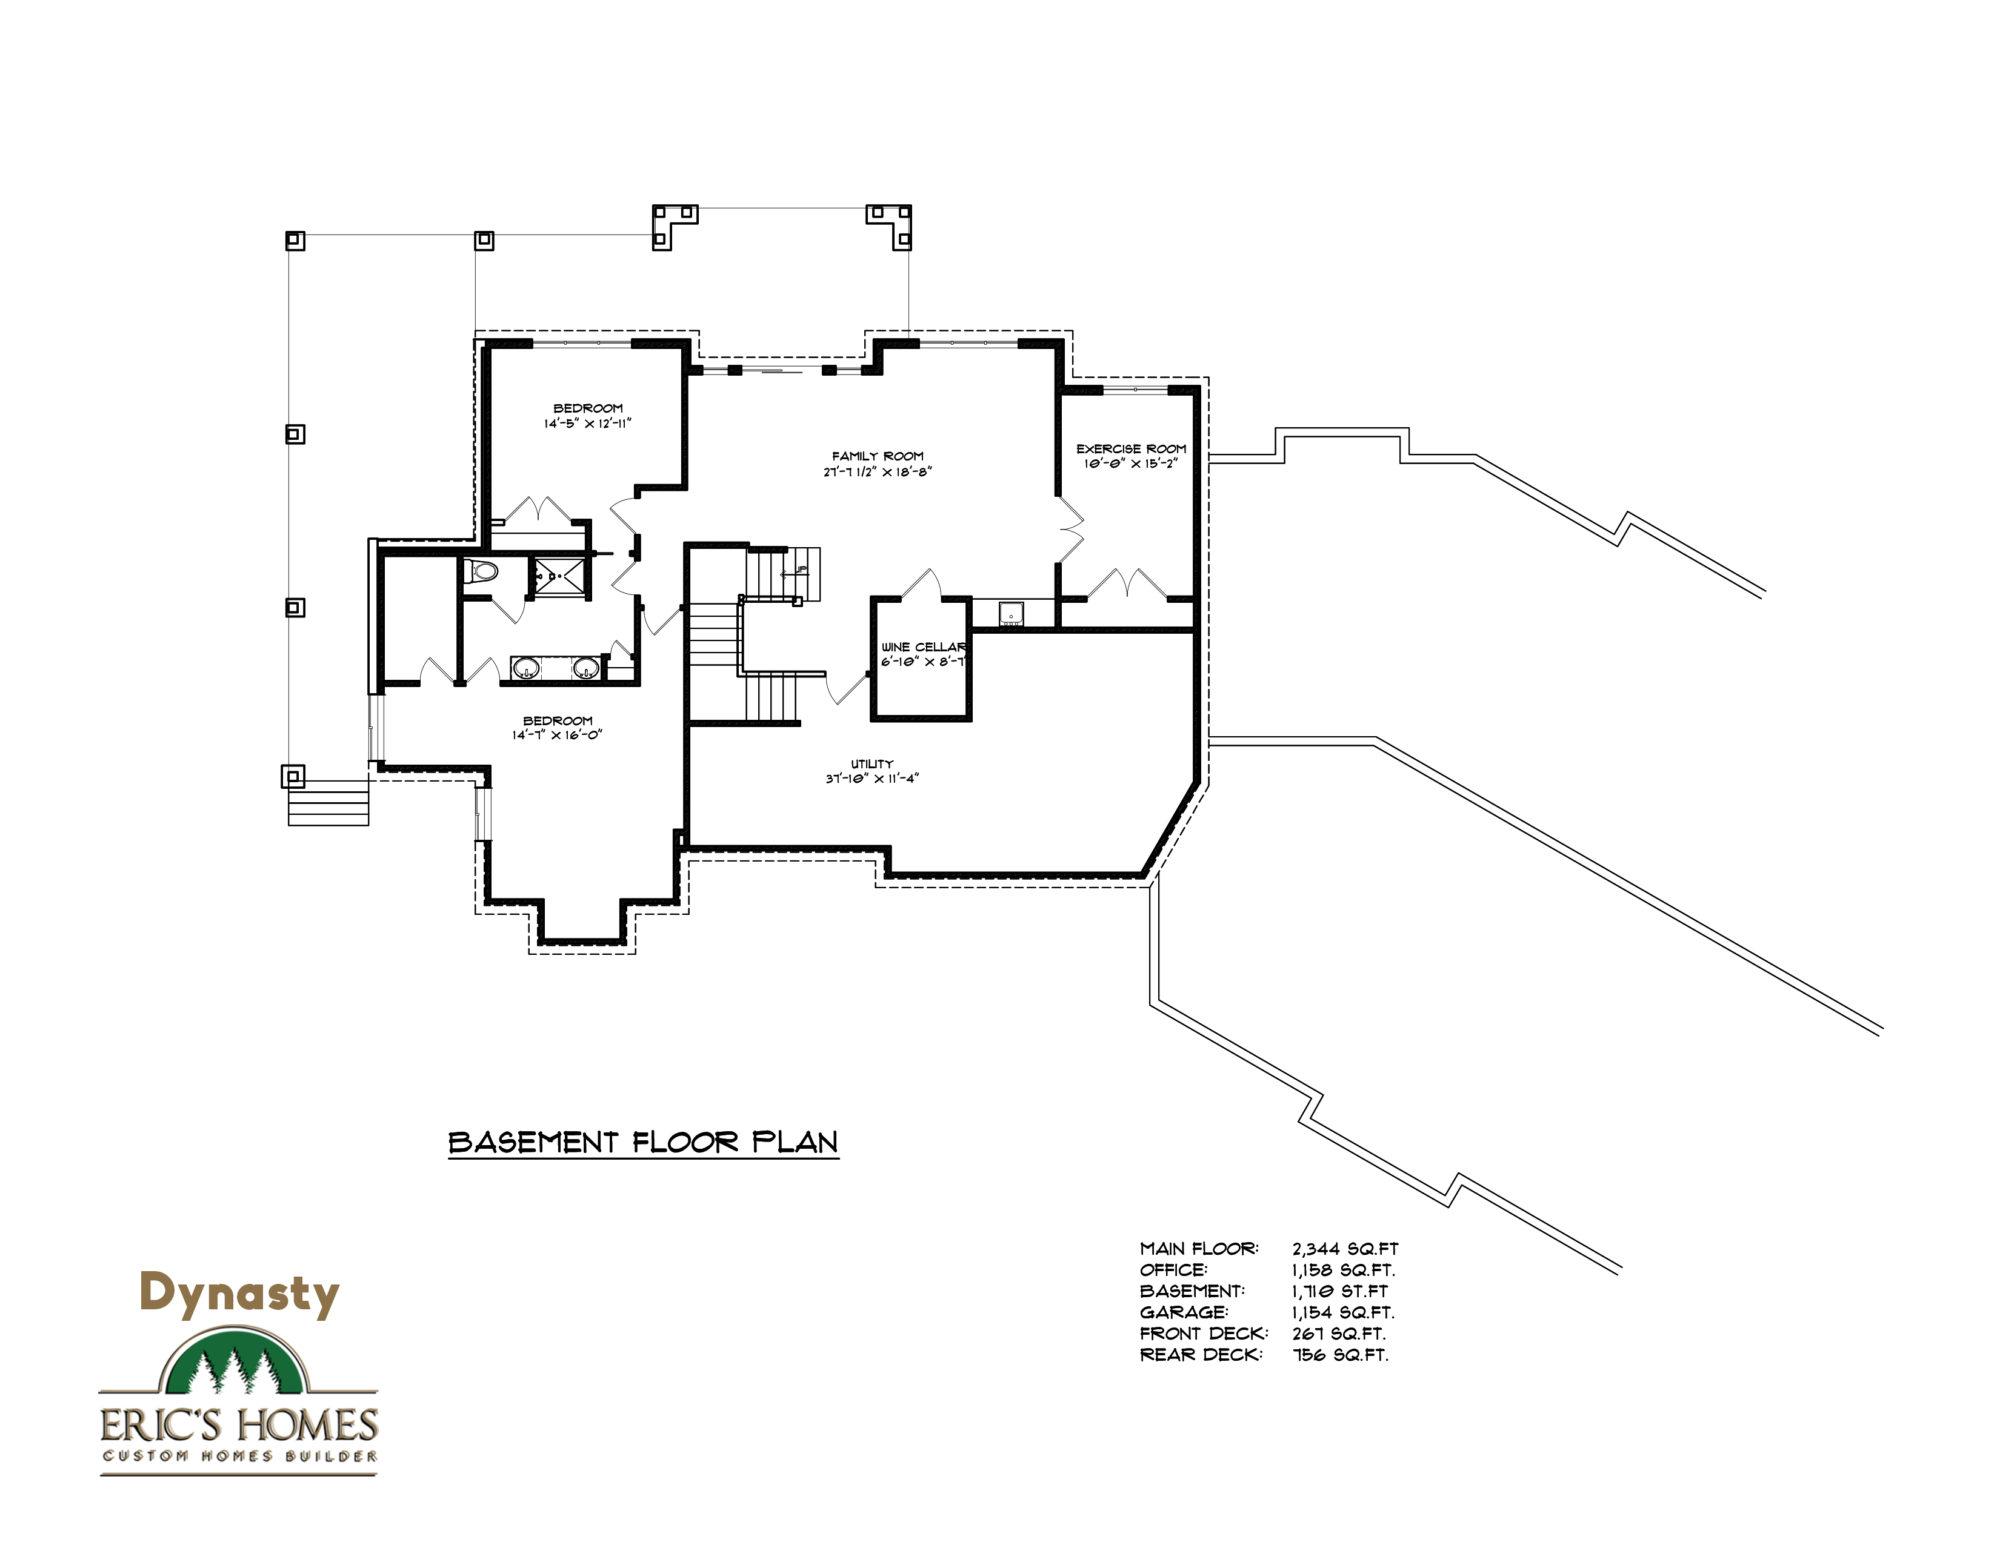 Dynasty brochure basement plan(3)